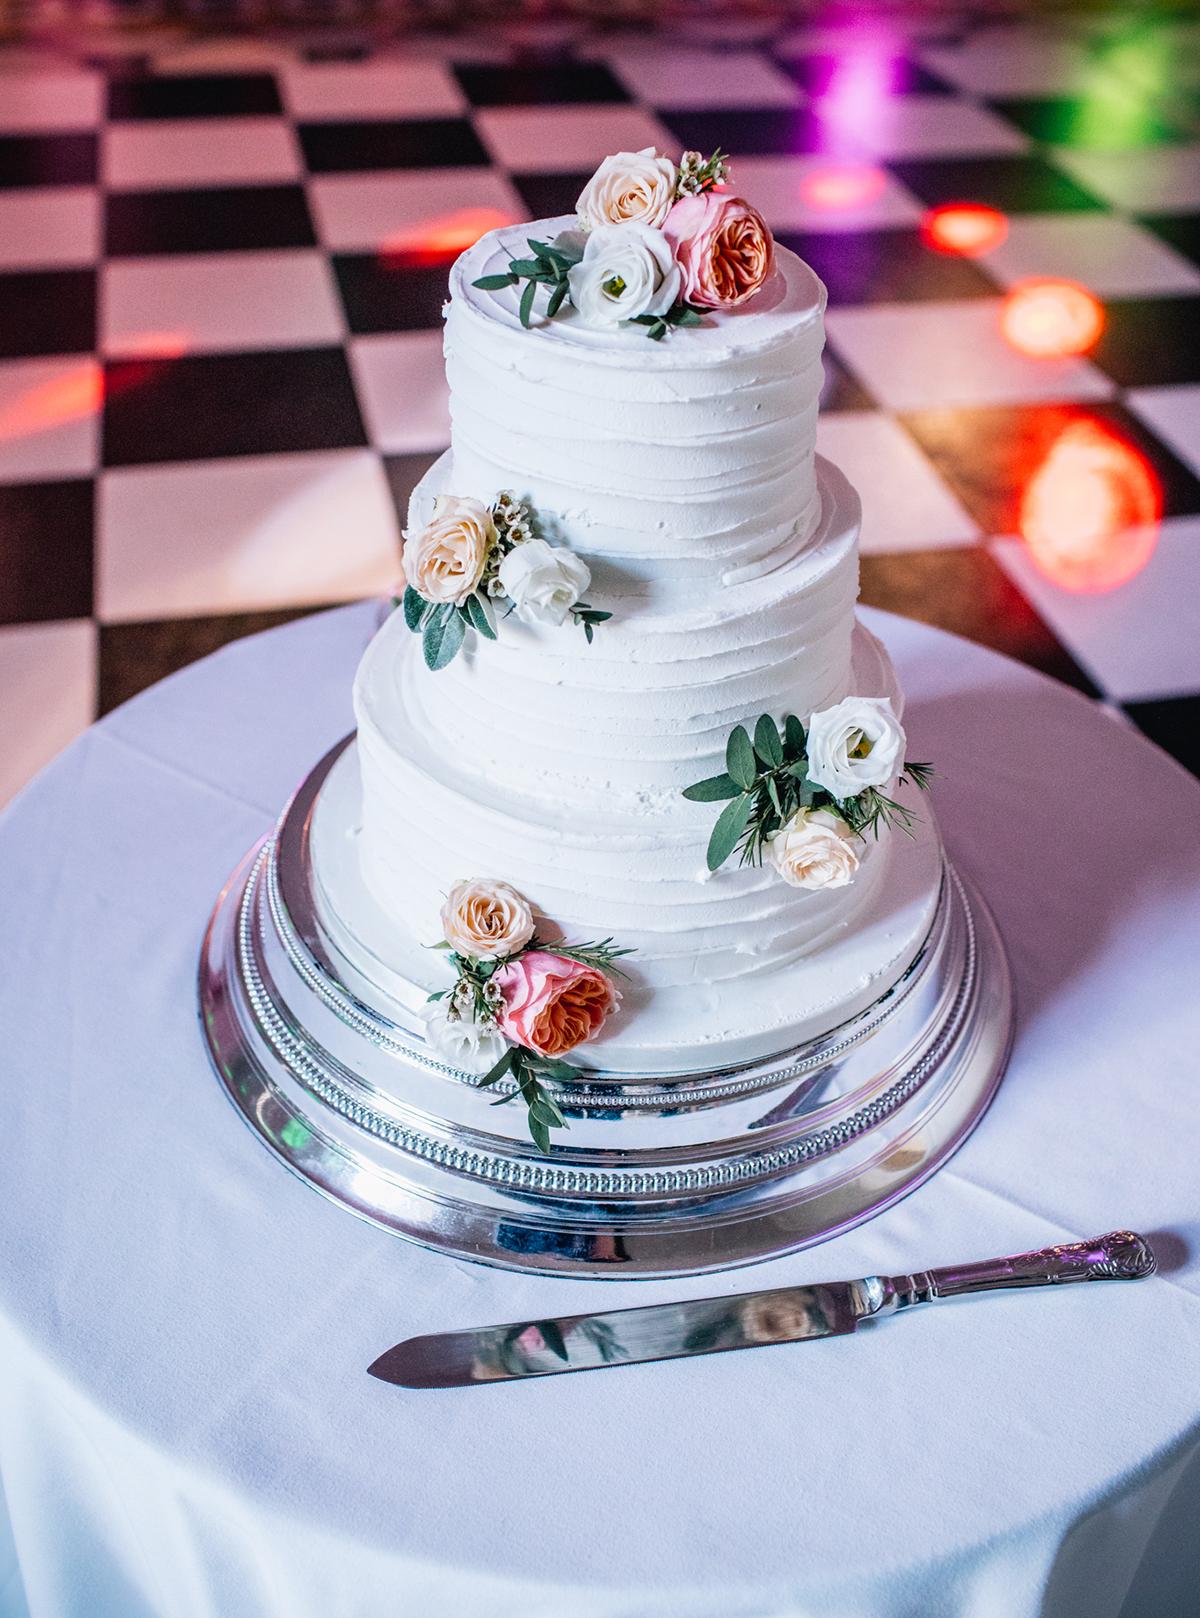 Rustic Wedding Cake with Orange Flowers